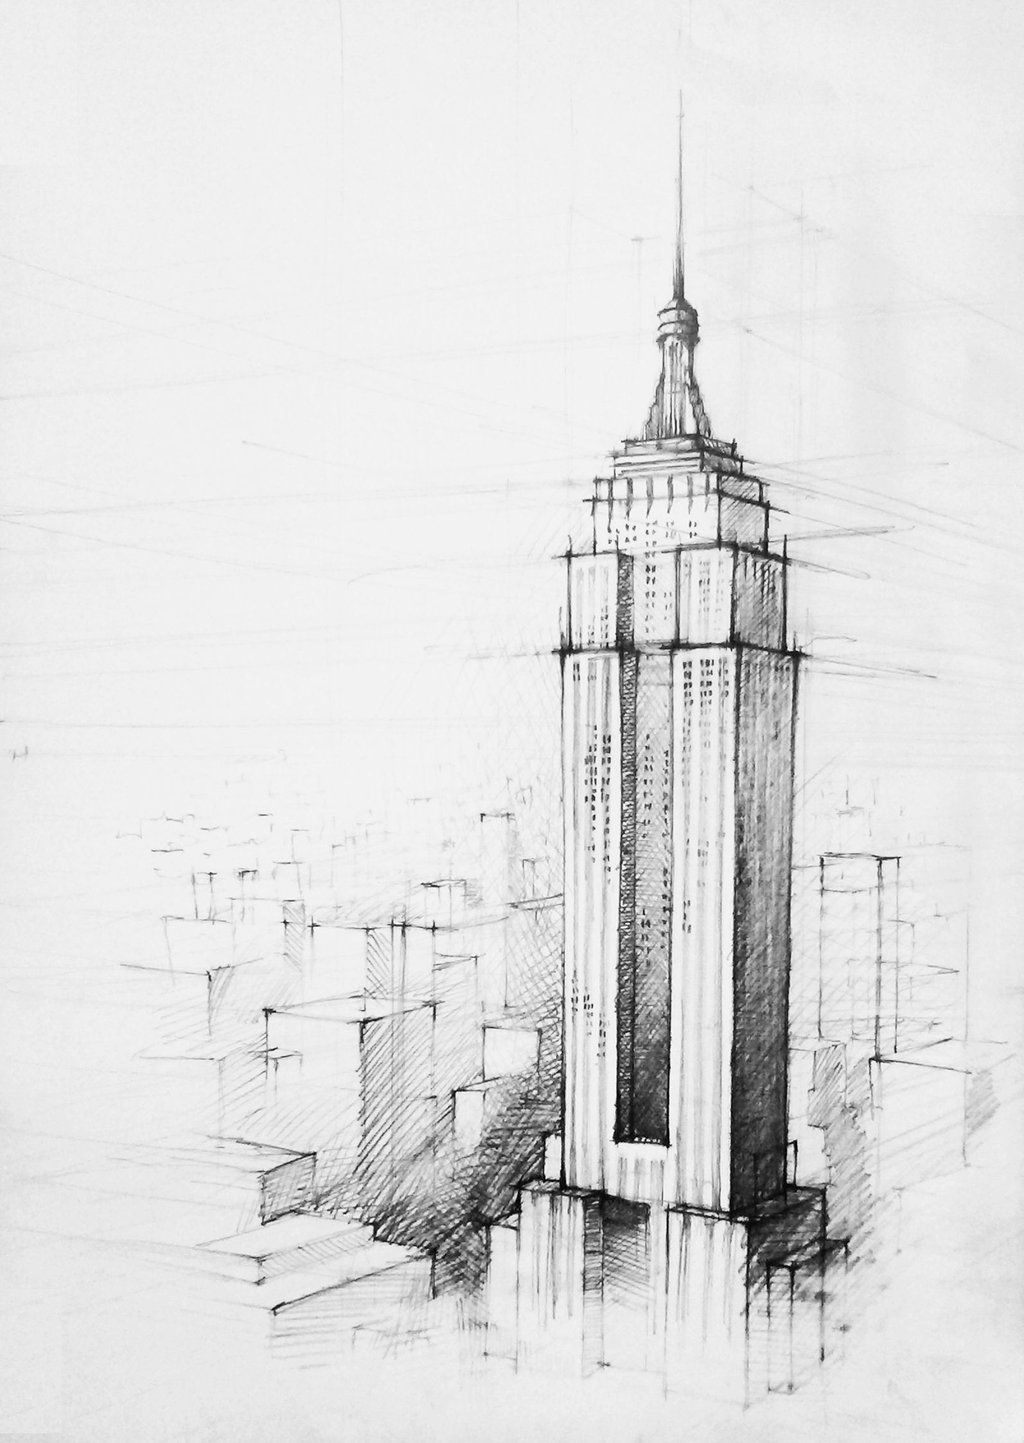 Empire State Building By Derbaku On Deviantart Empire State Building Drawing Architecture Drawing Sketchbooks City Drawing